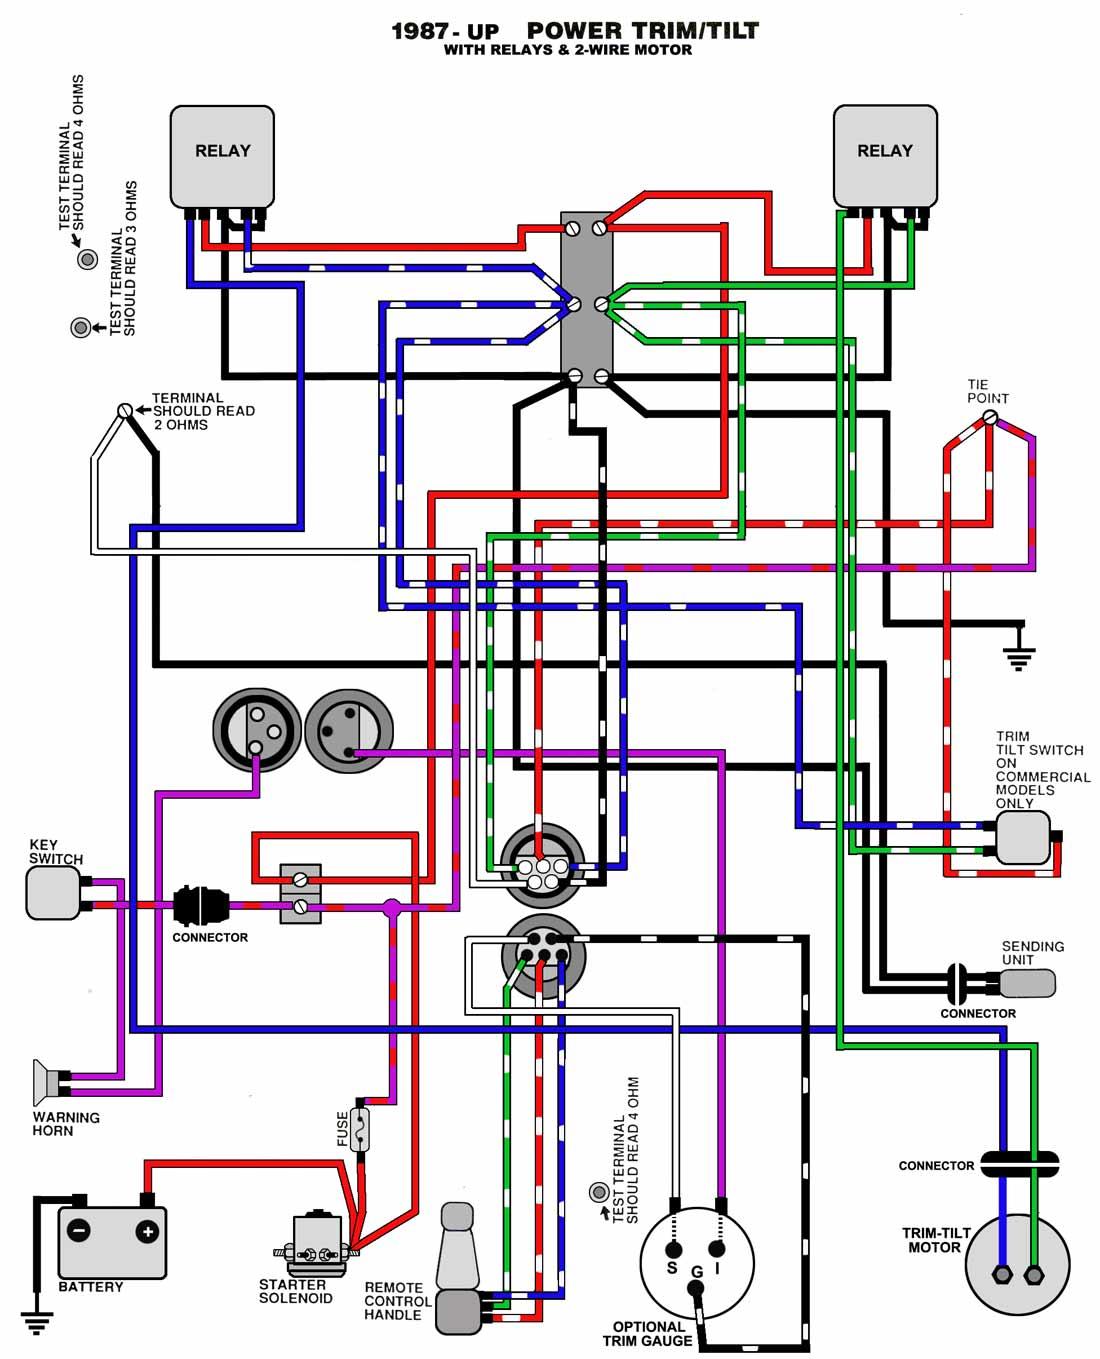 Honda Bf90 Wiring Diagram Guide And Troubleshooting Of Bf75 Diagrams Rh 12 Jennifer Retzke De Parts